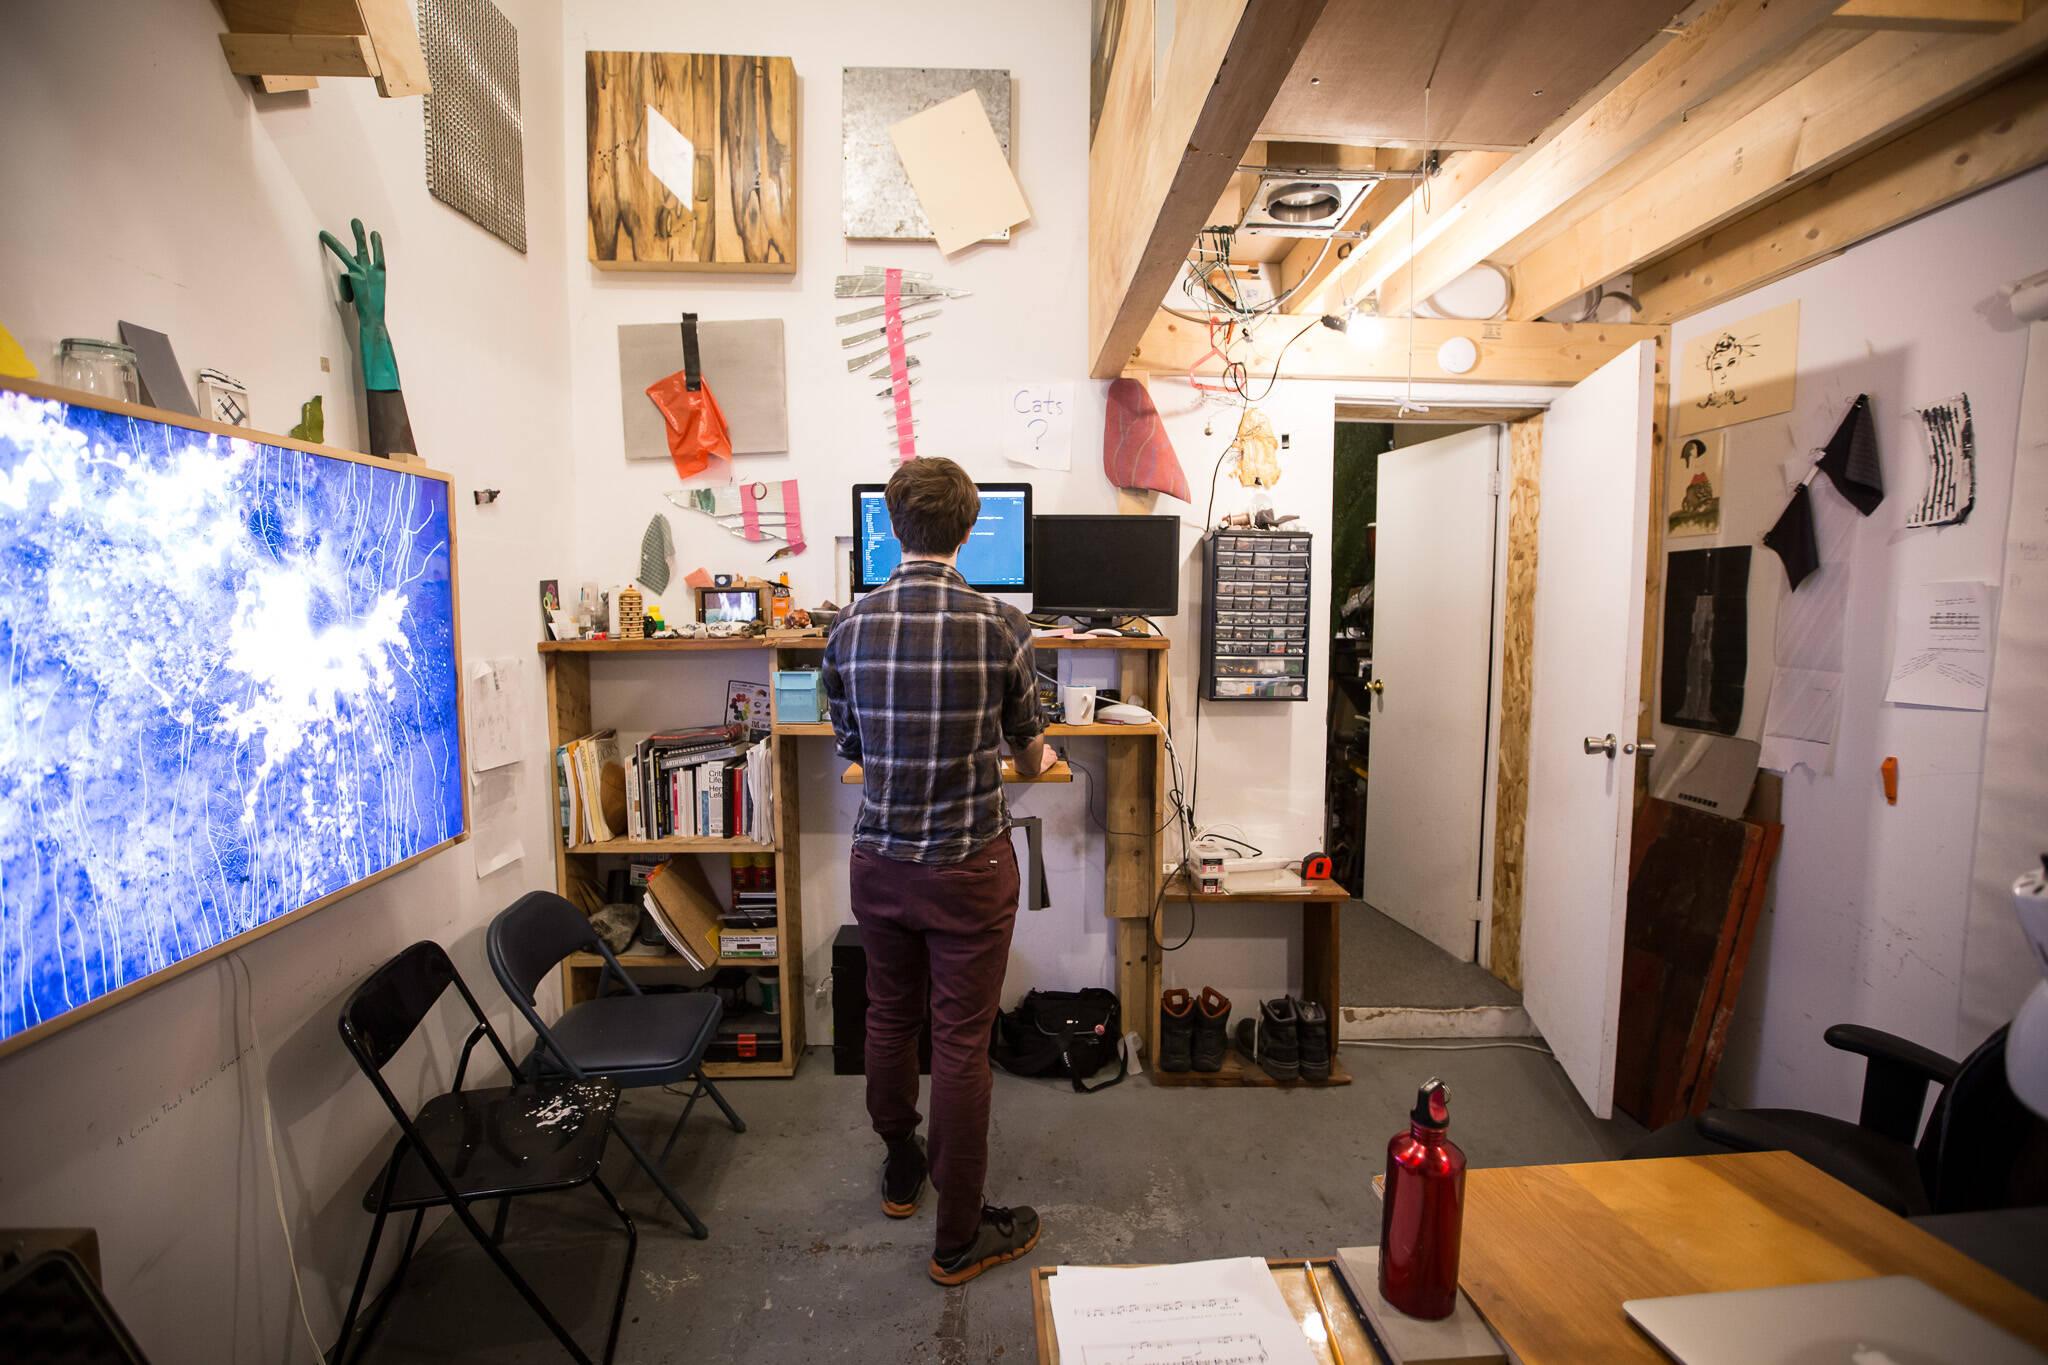 Future Port Lands art Toronto